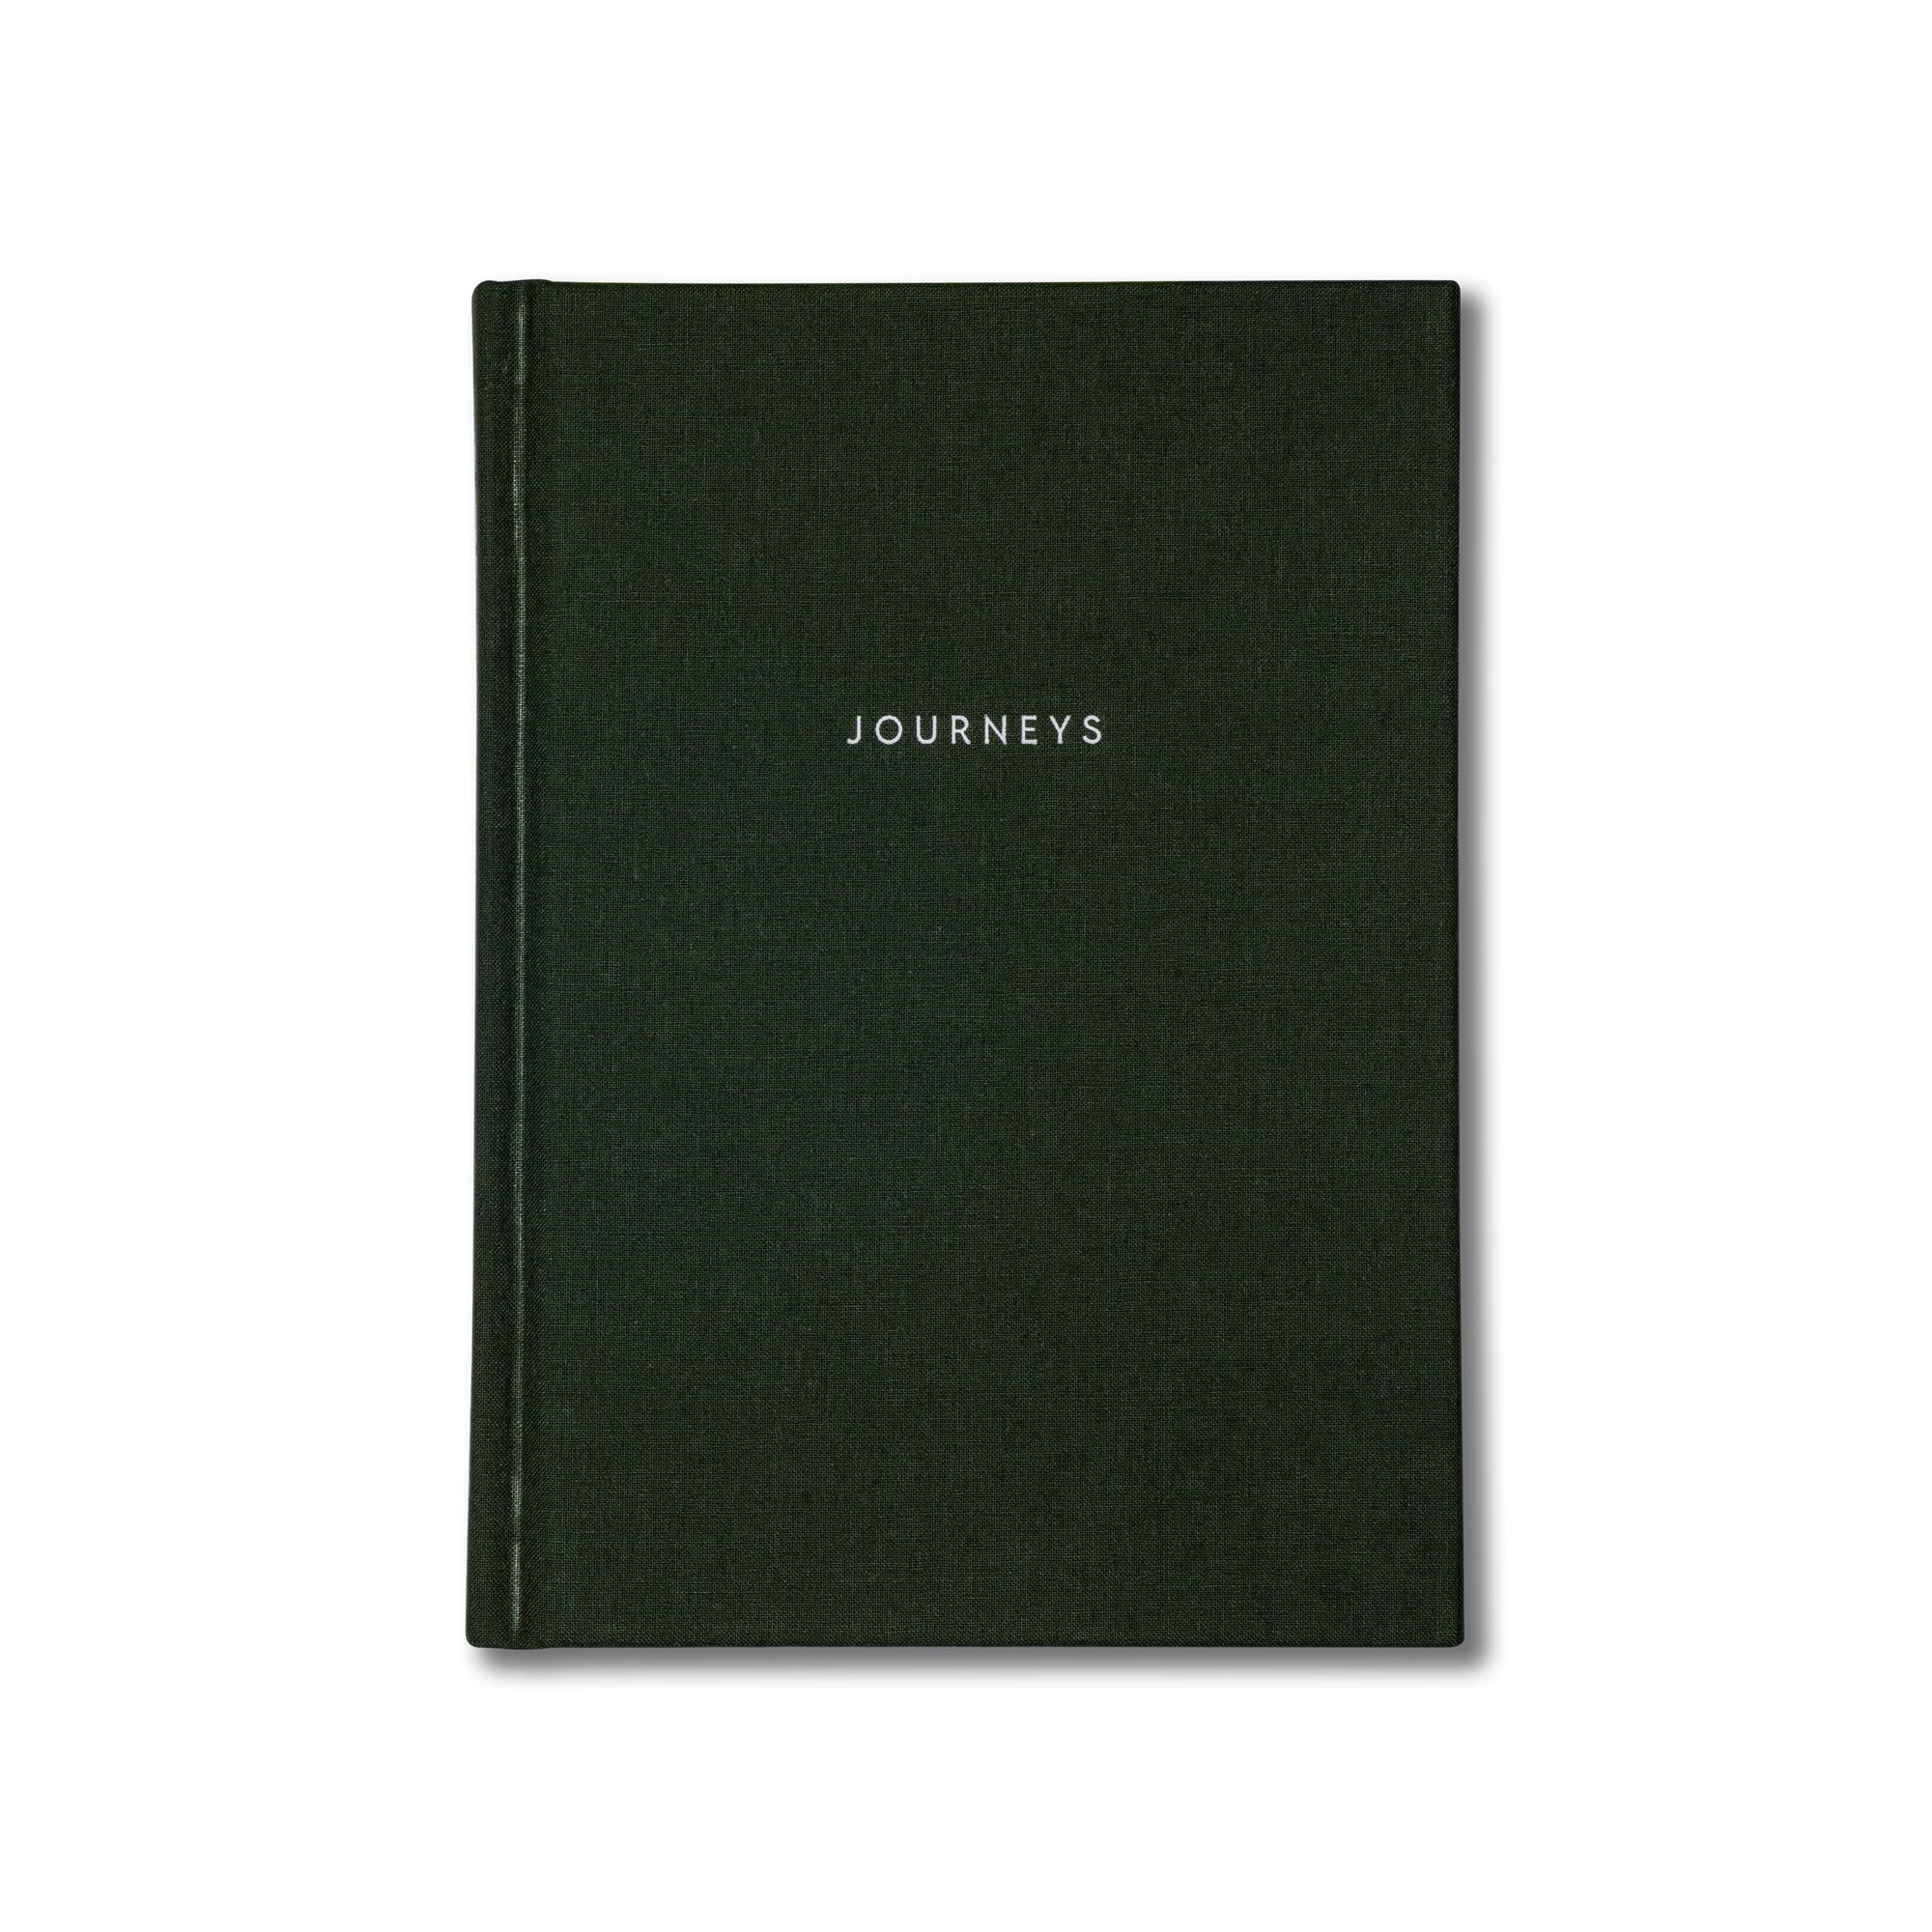 KARTOTEK - Travel Journal